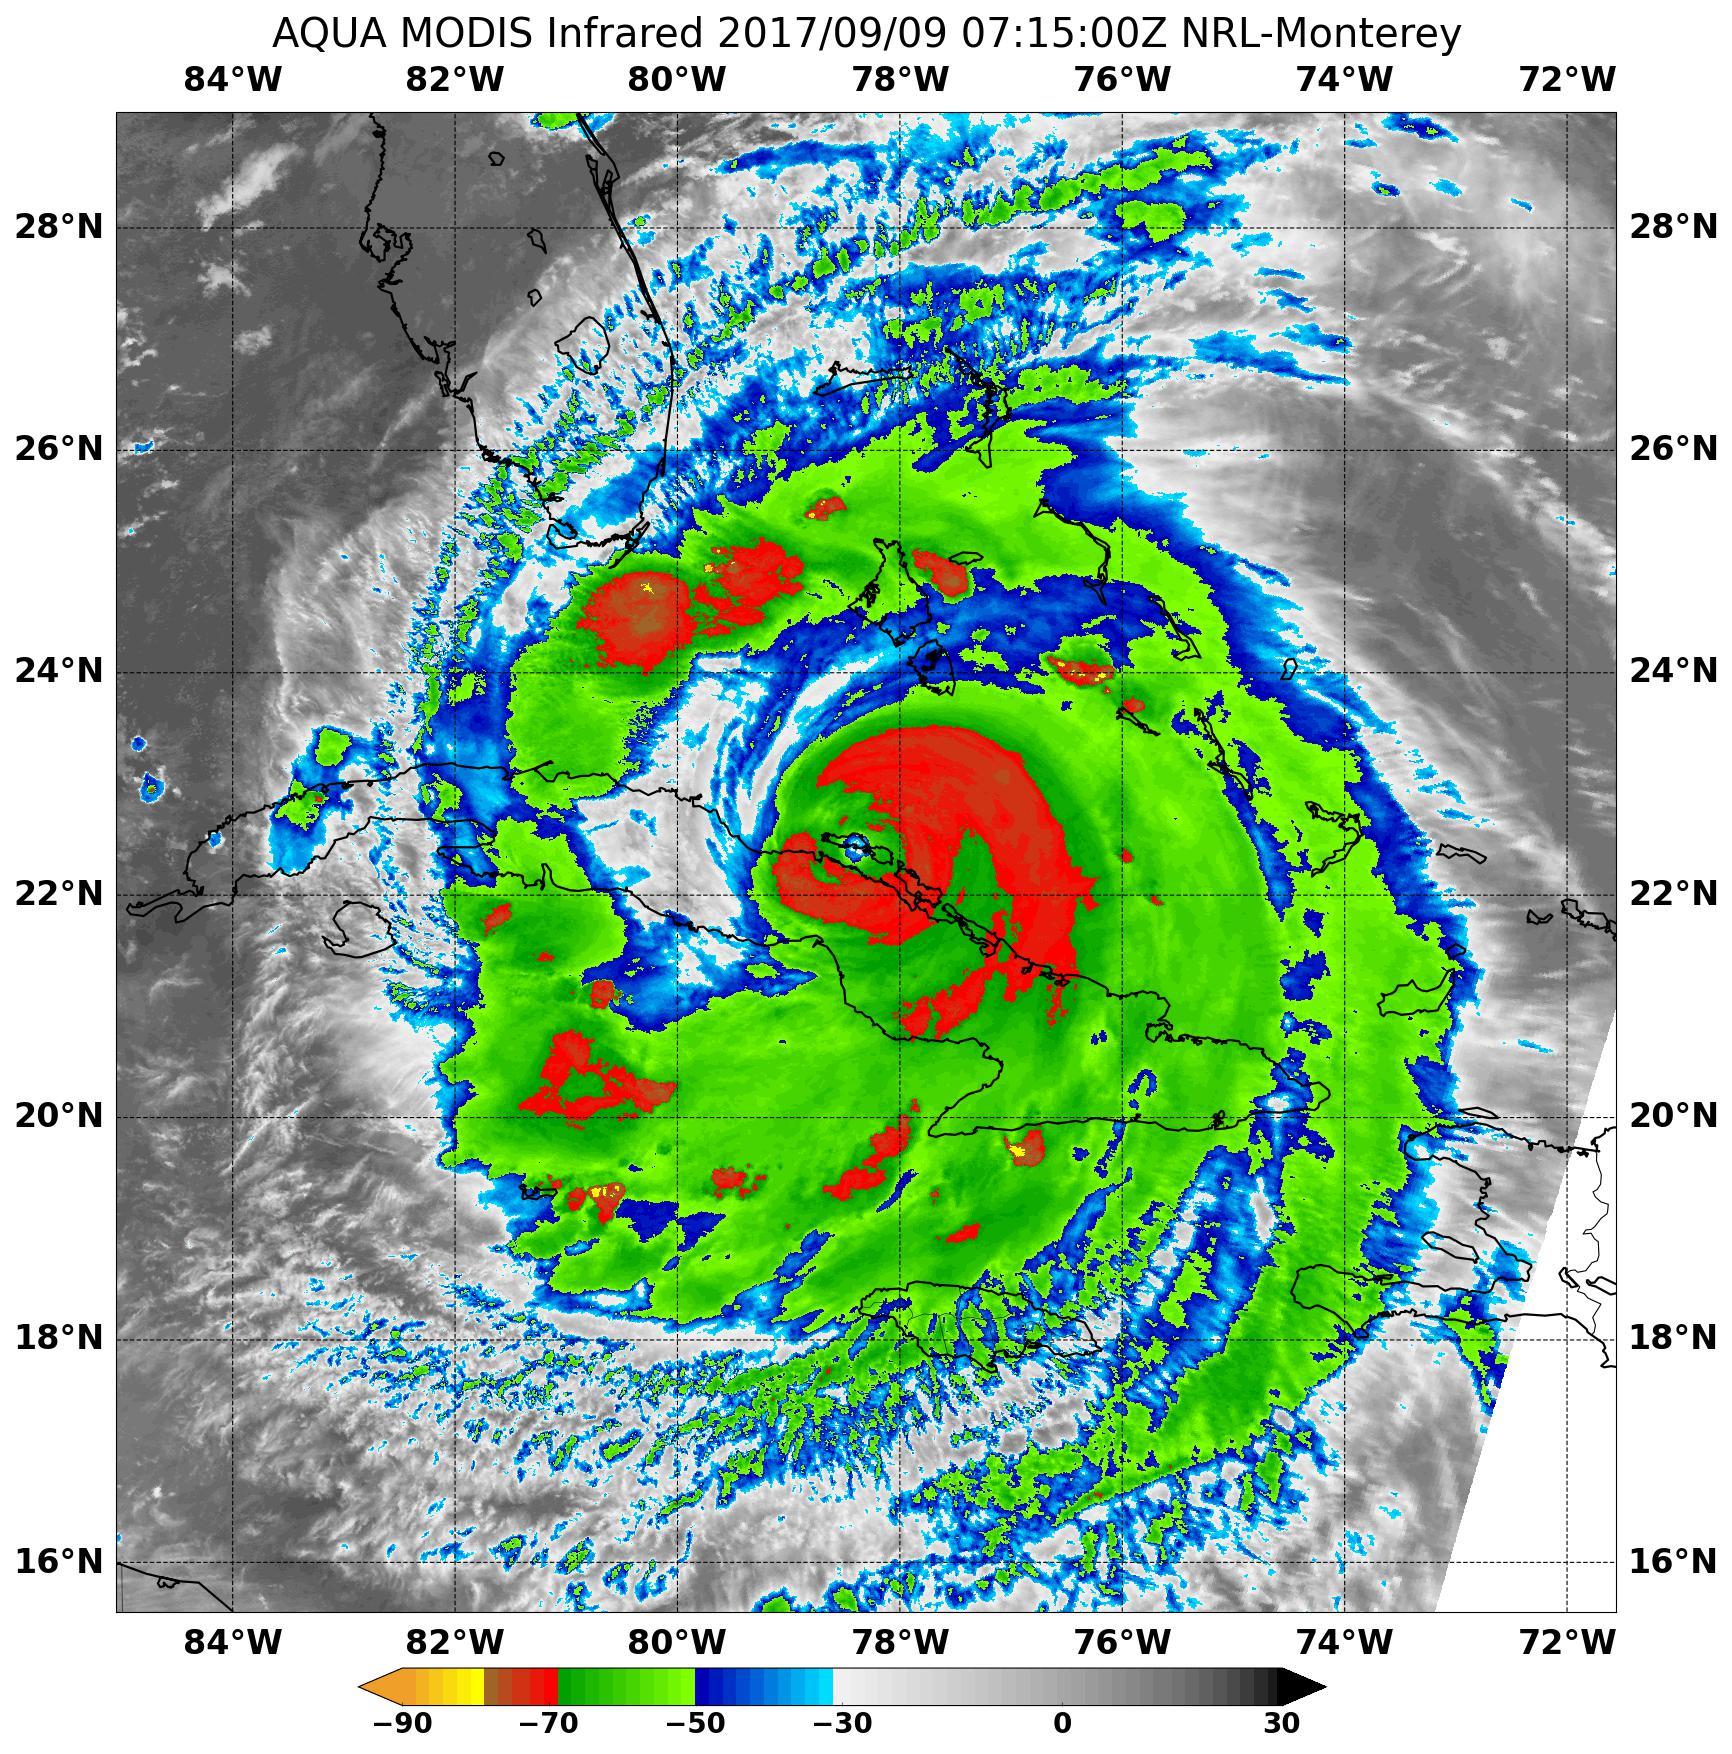 AIRS Image of Irma